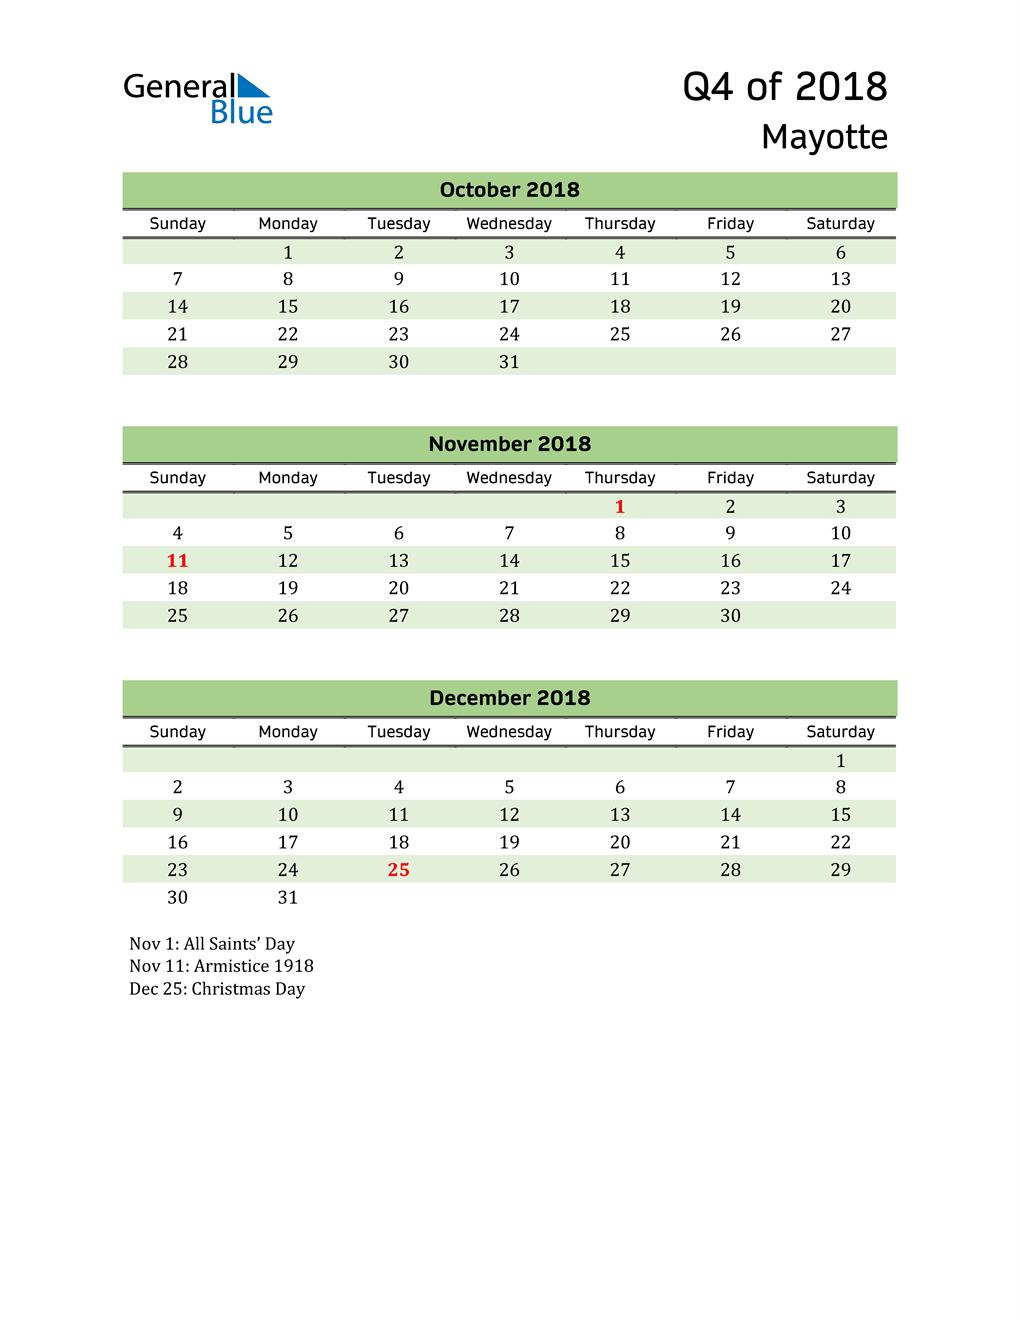 Quarterly Calendar 2018 with Mayotte Holidays